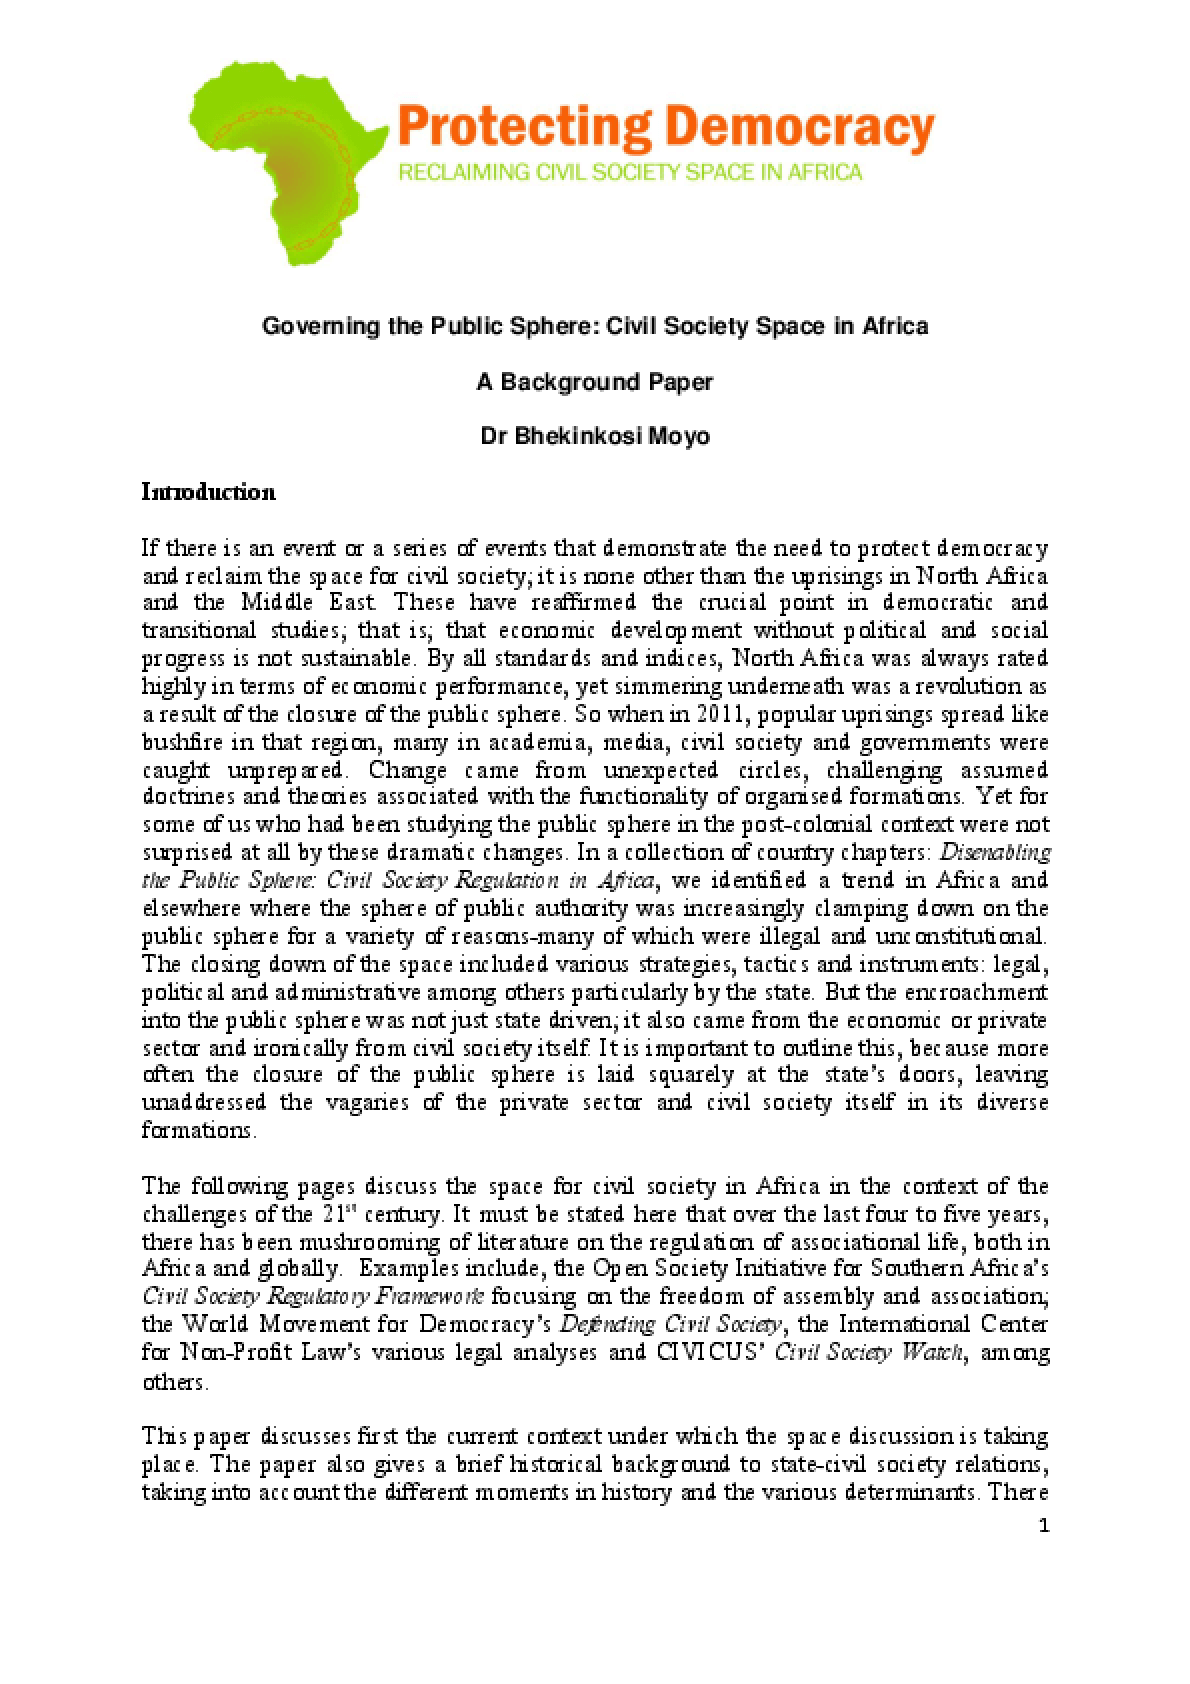 Civil Society Space in Africa